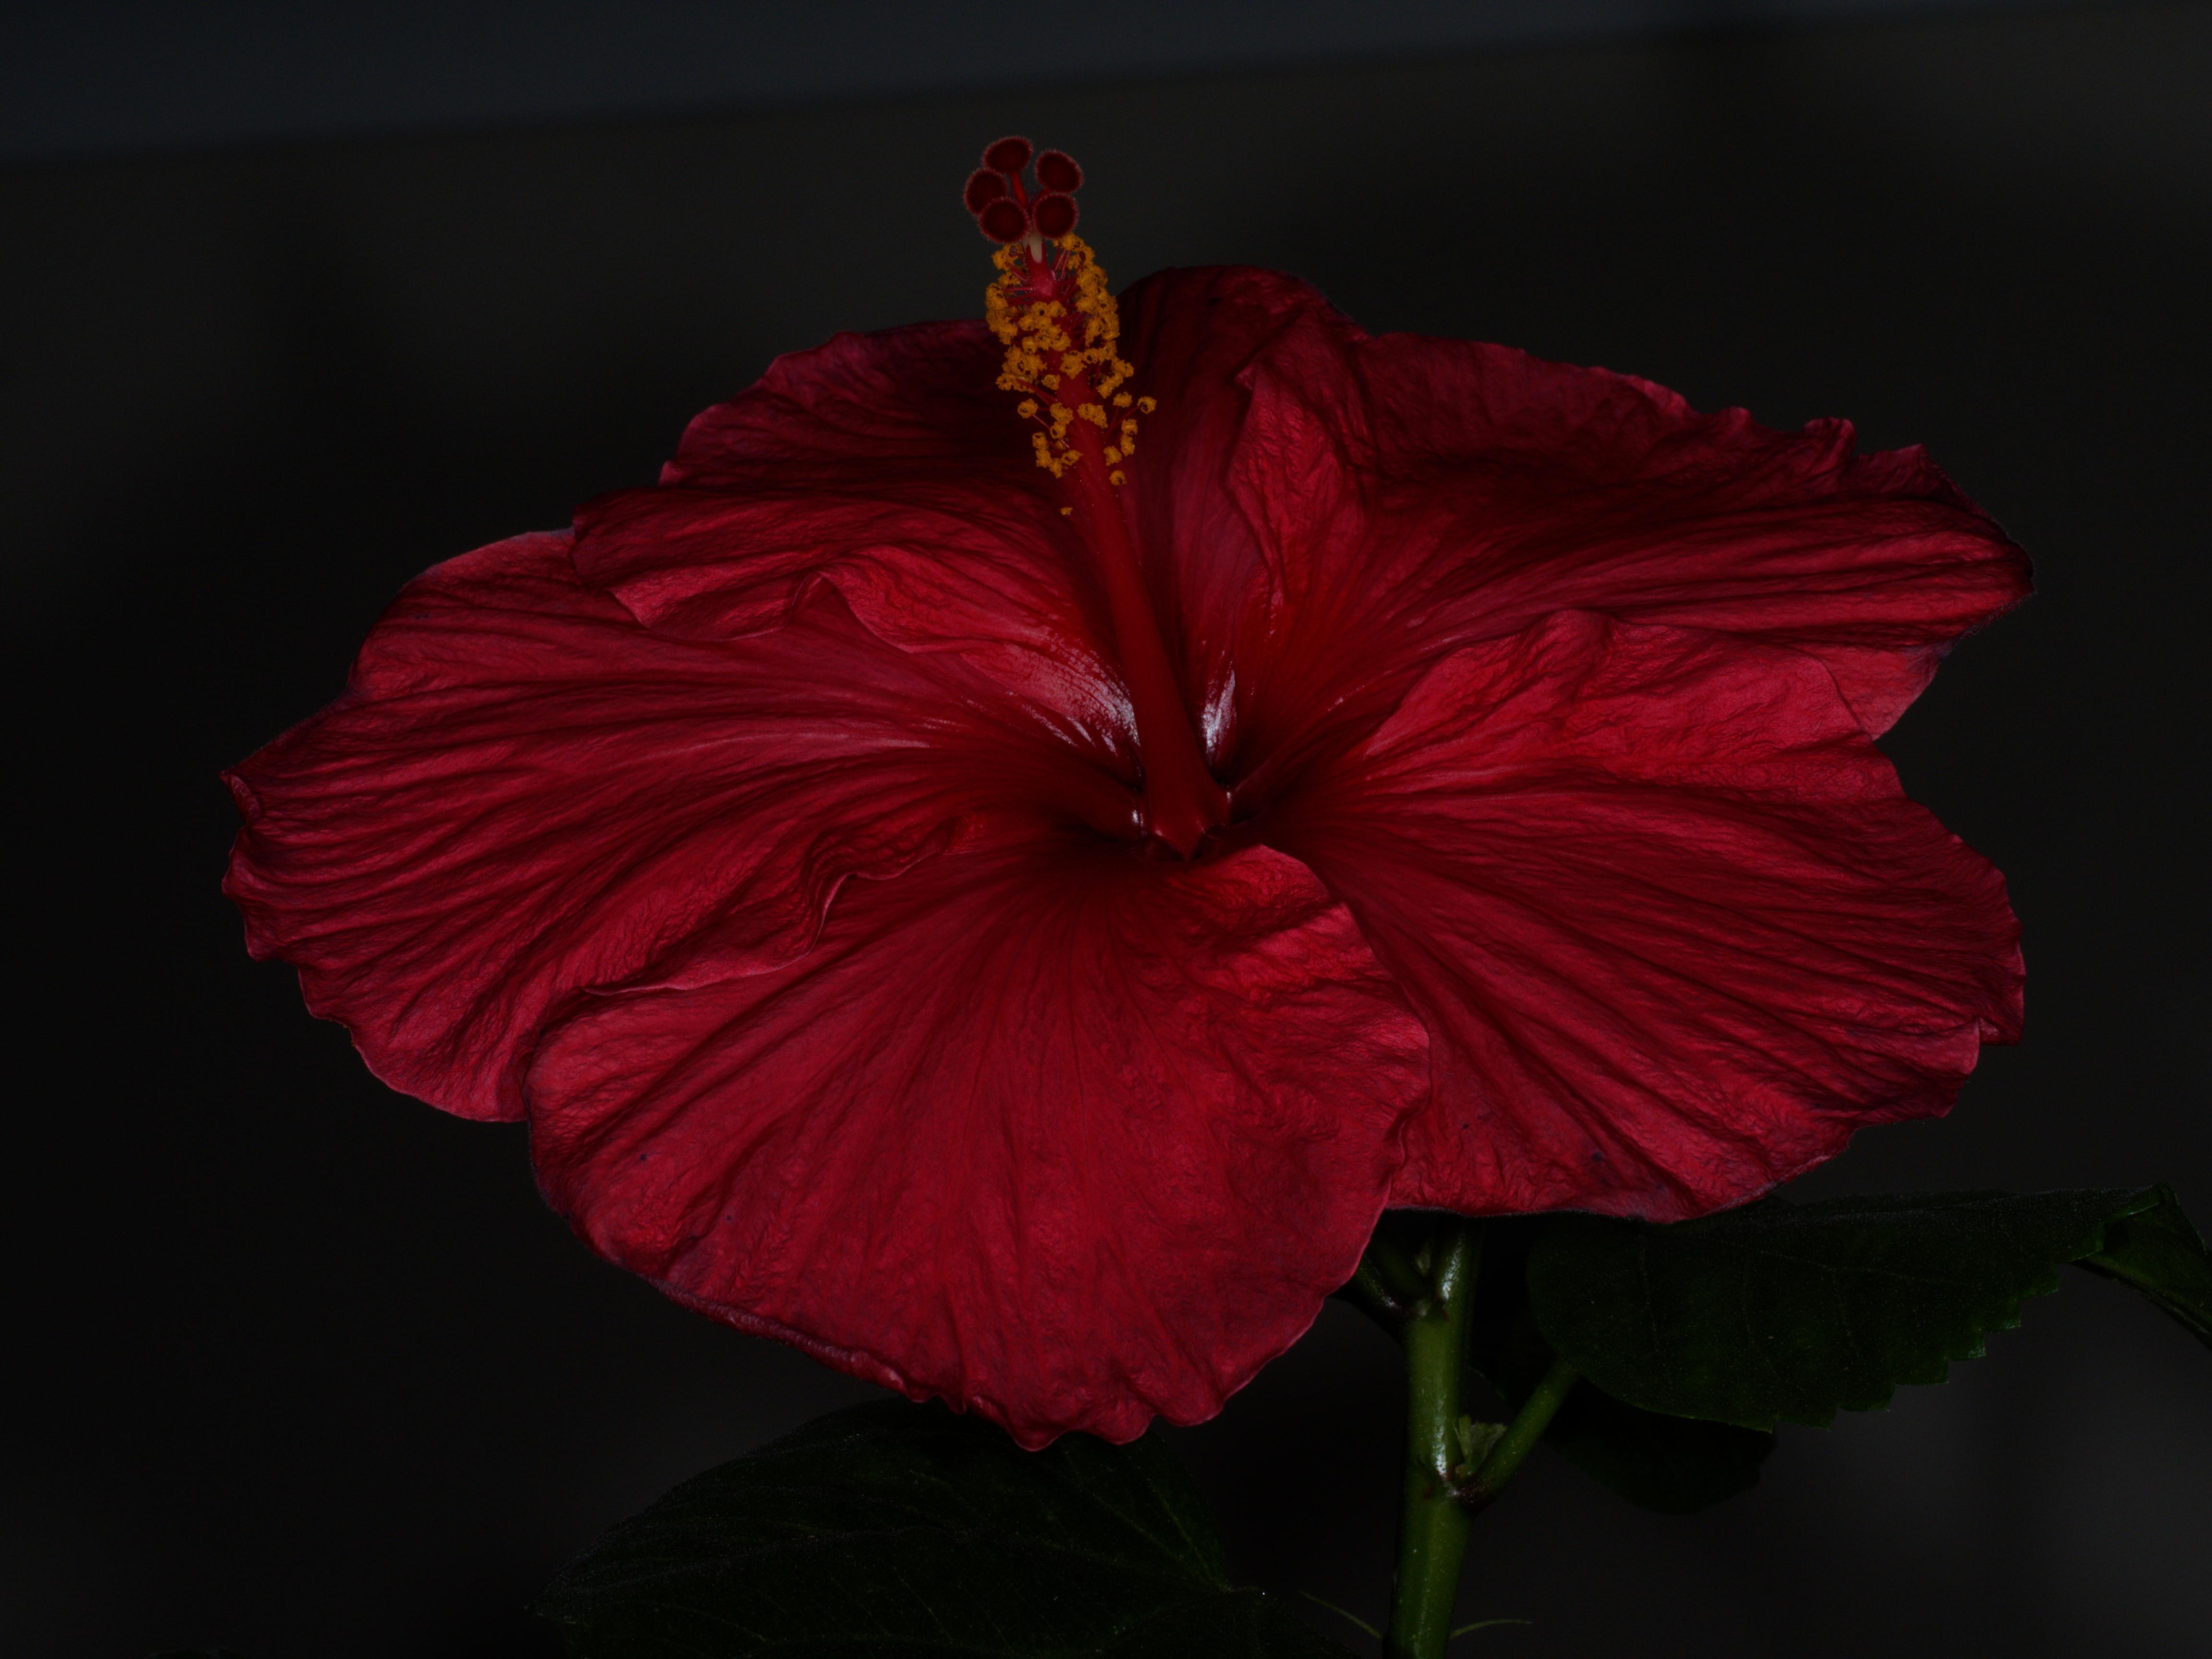 Hibiscus-STF-8-2.jpeg